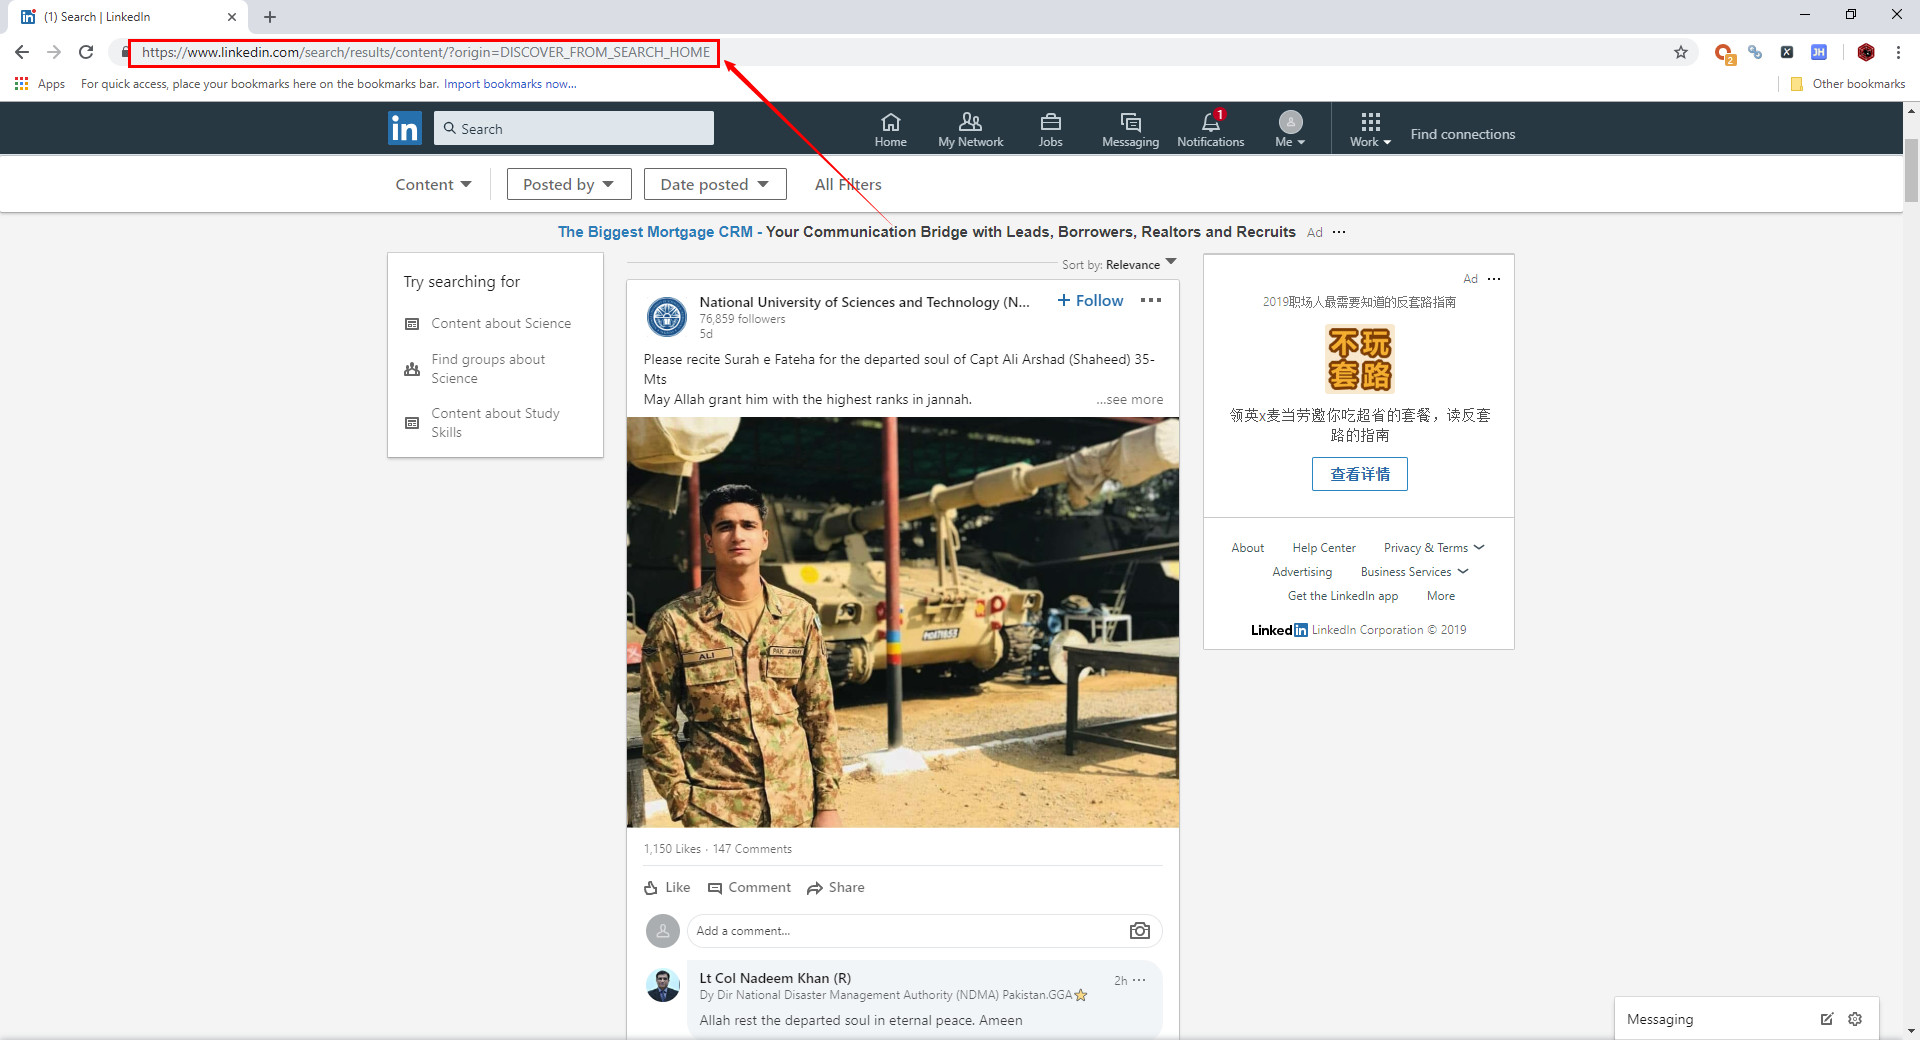 How to Scrape Posts from LinkedIn - LinkedIn Scraper